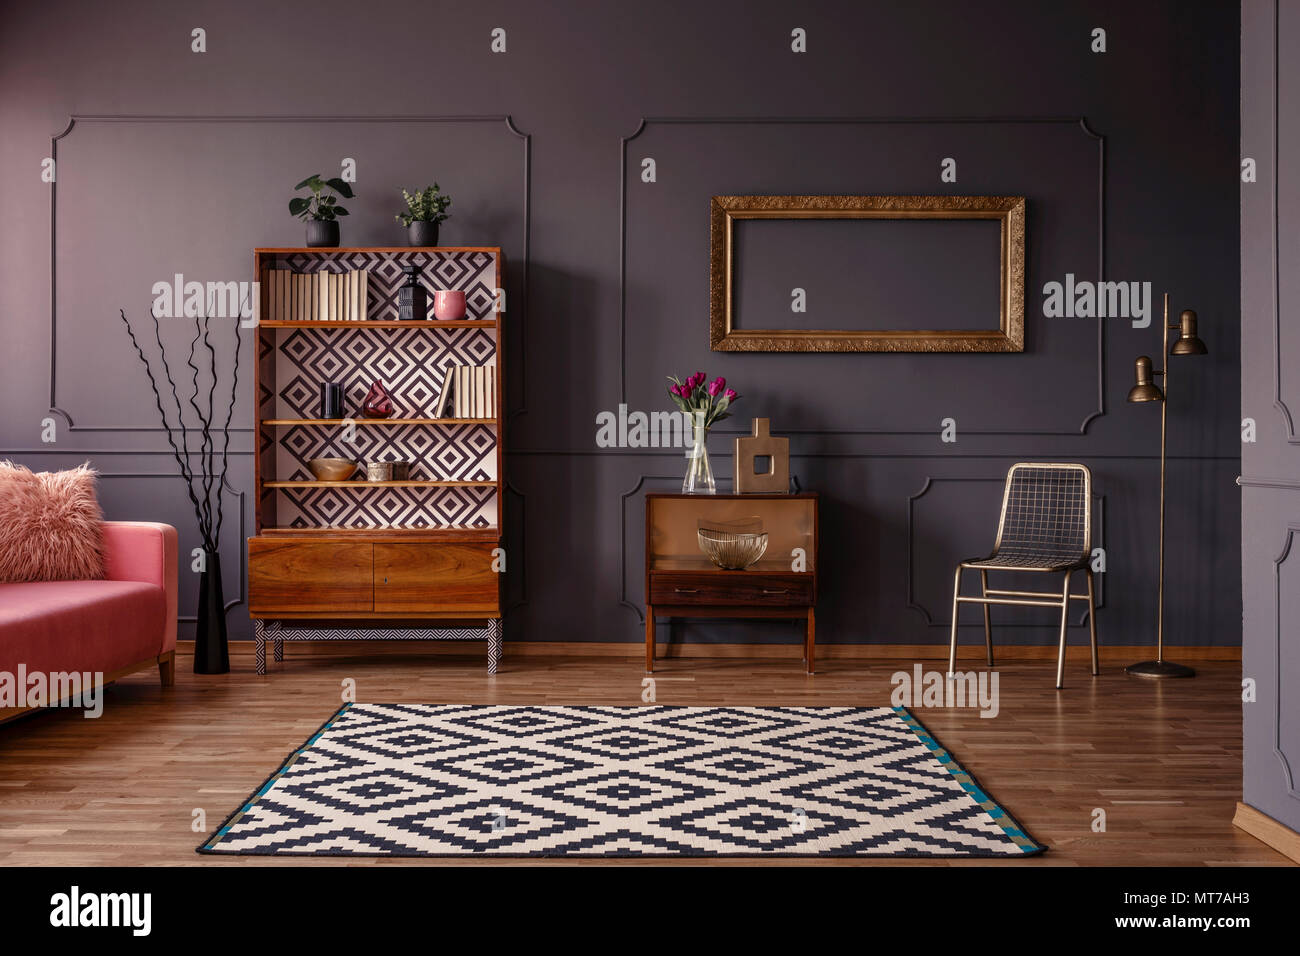 Vintage living room interior with a patterned rug, cupboard, golden ...